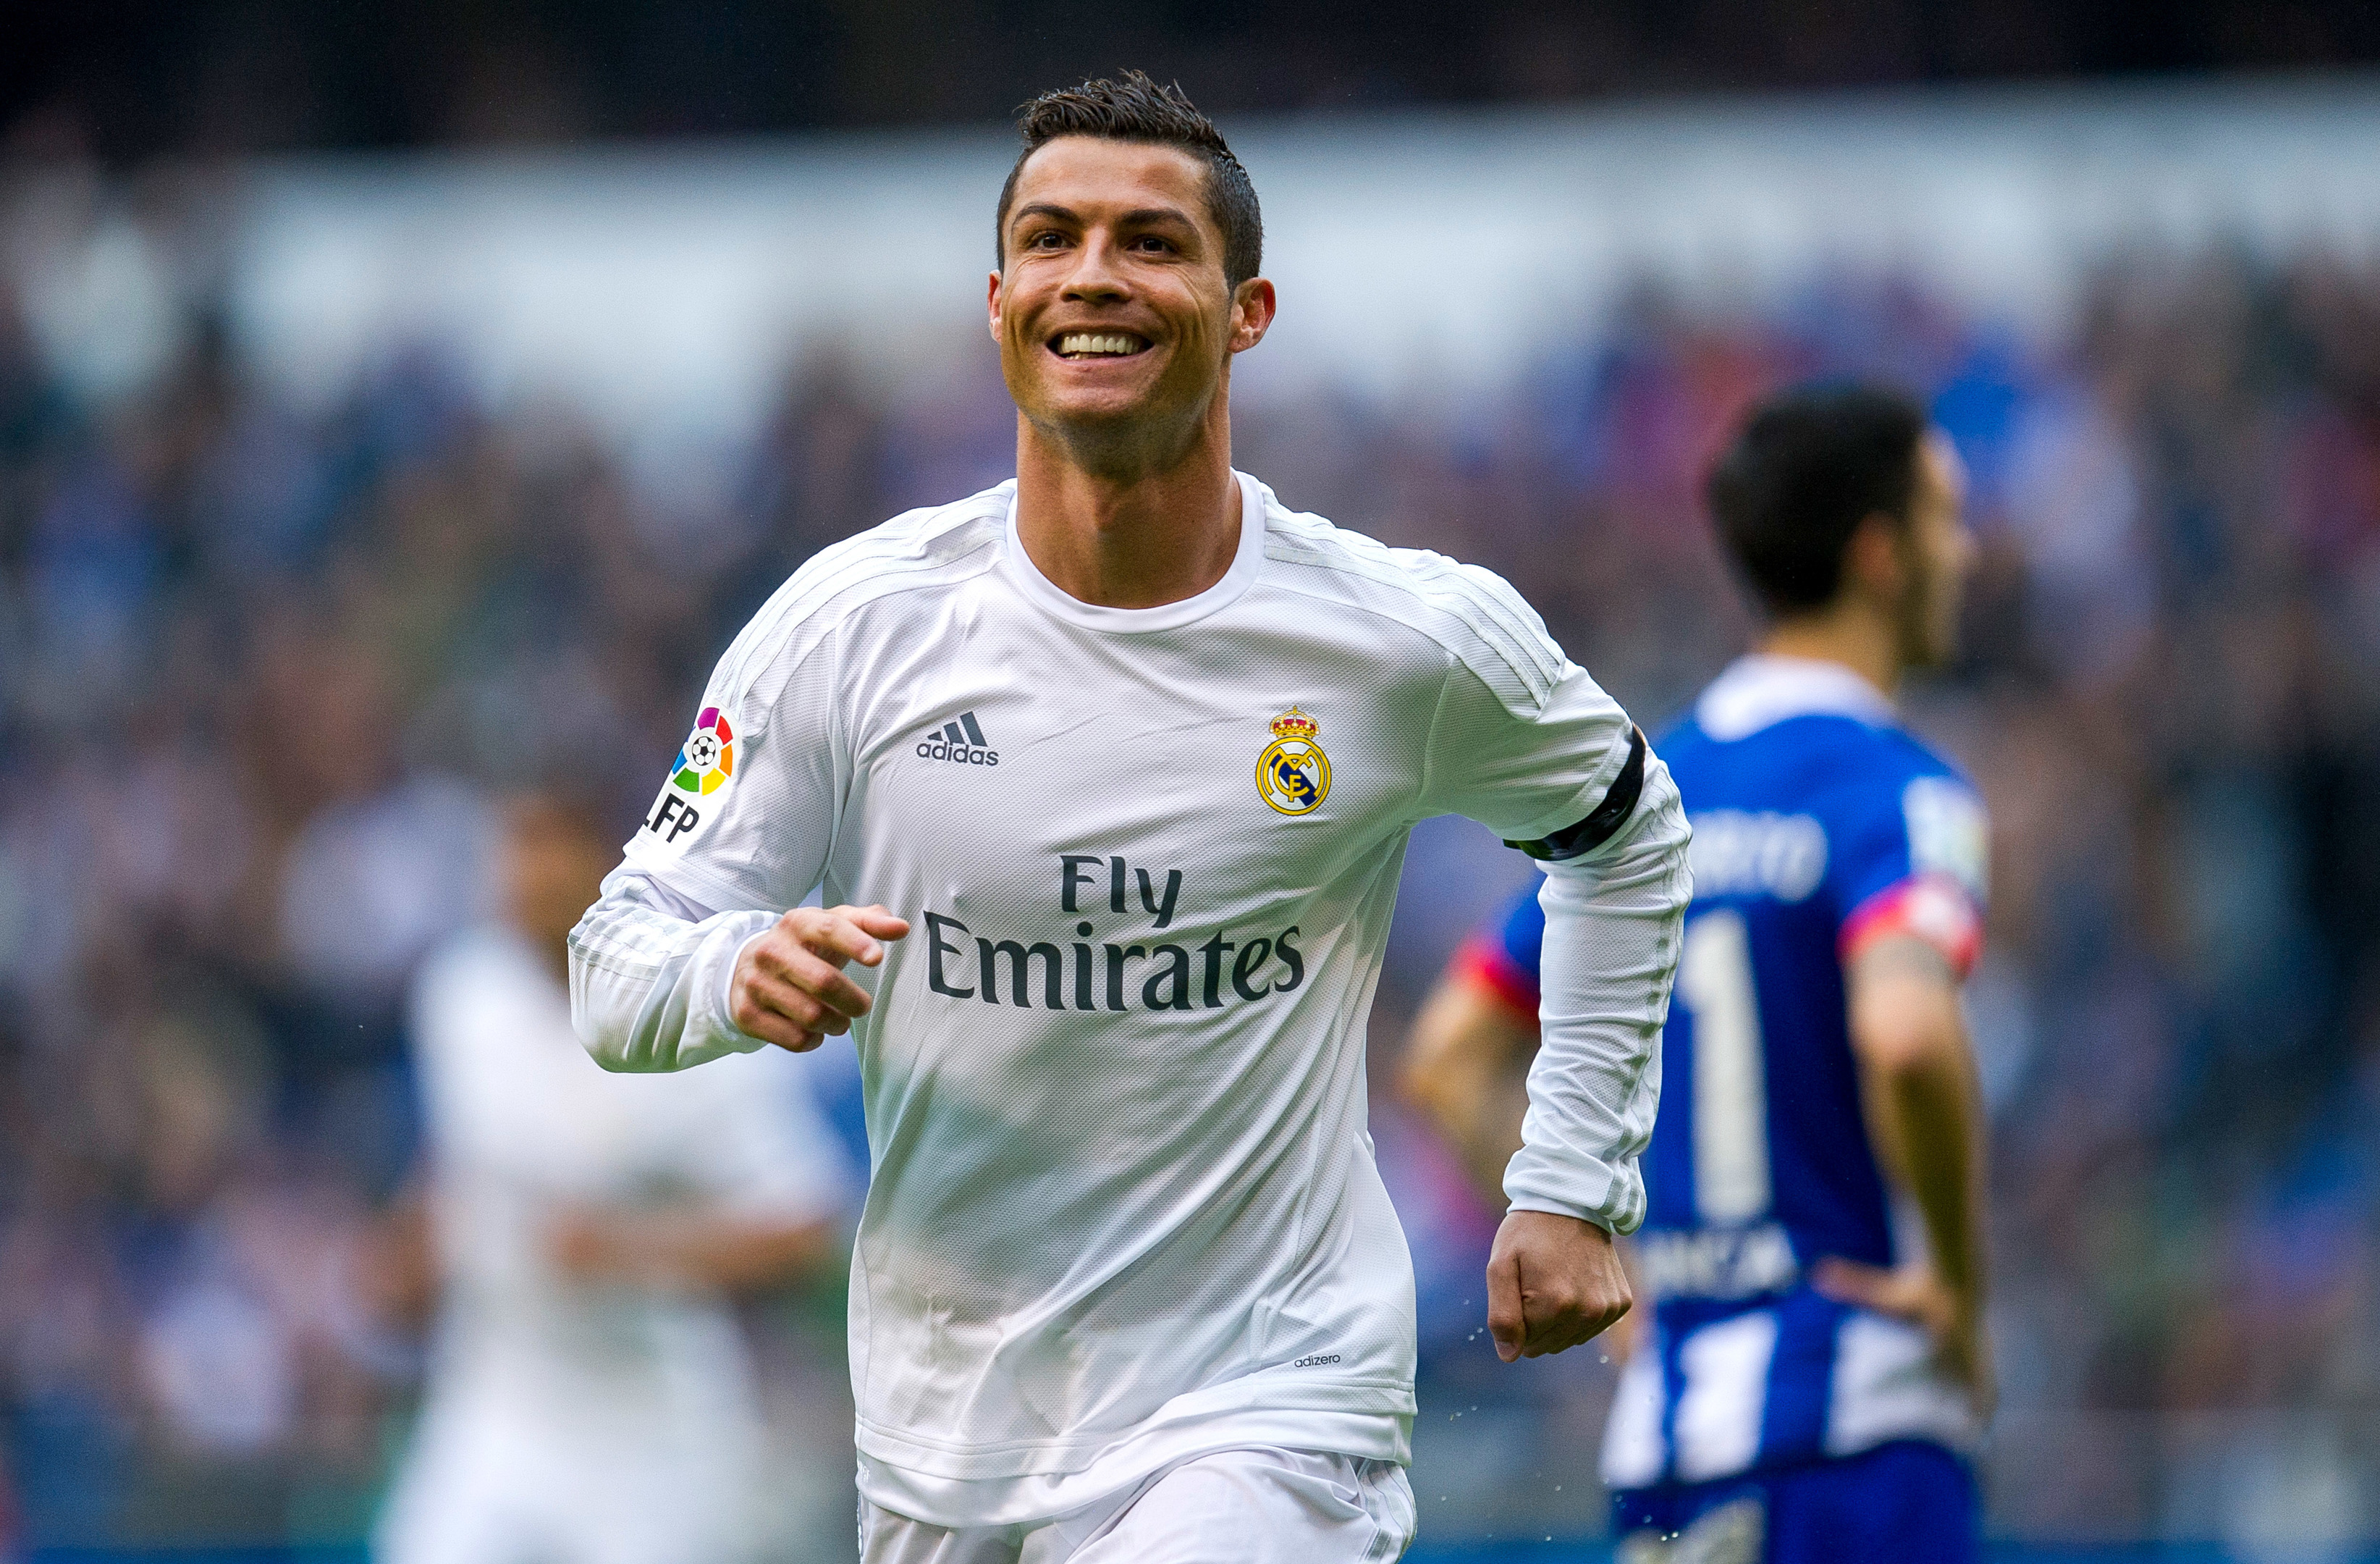 Cristiano Ronaldo of Real Madrid.